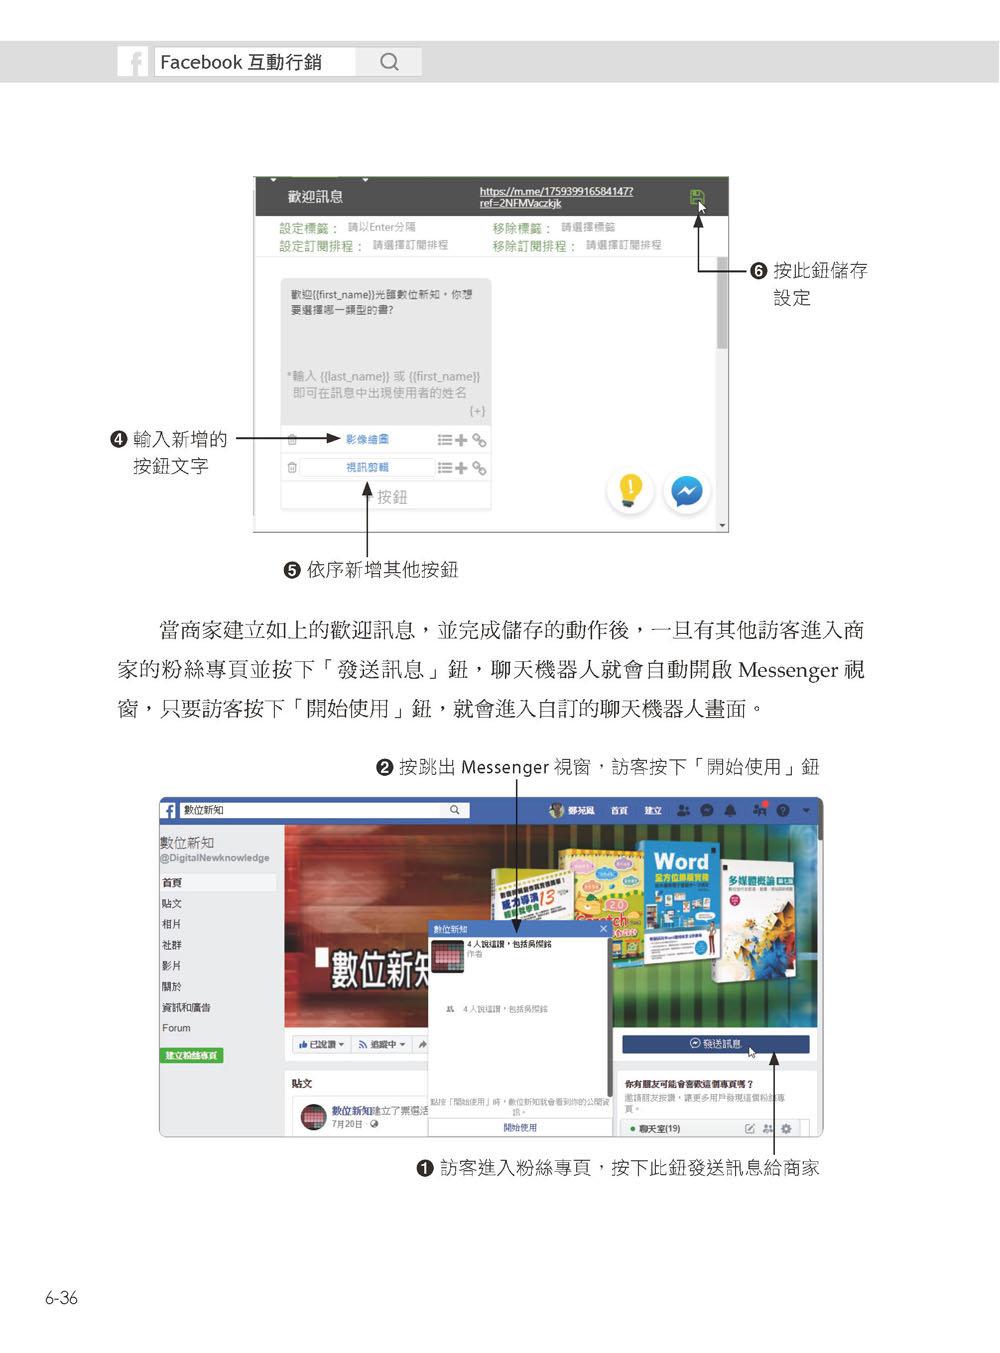 Facebook 互動行銷:社群口碑經營新思路+廣告投放如何有成效,想做好臉書行銷,操作心法就在這!-preview-24